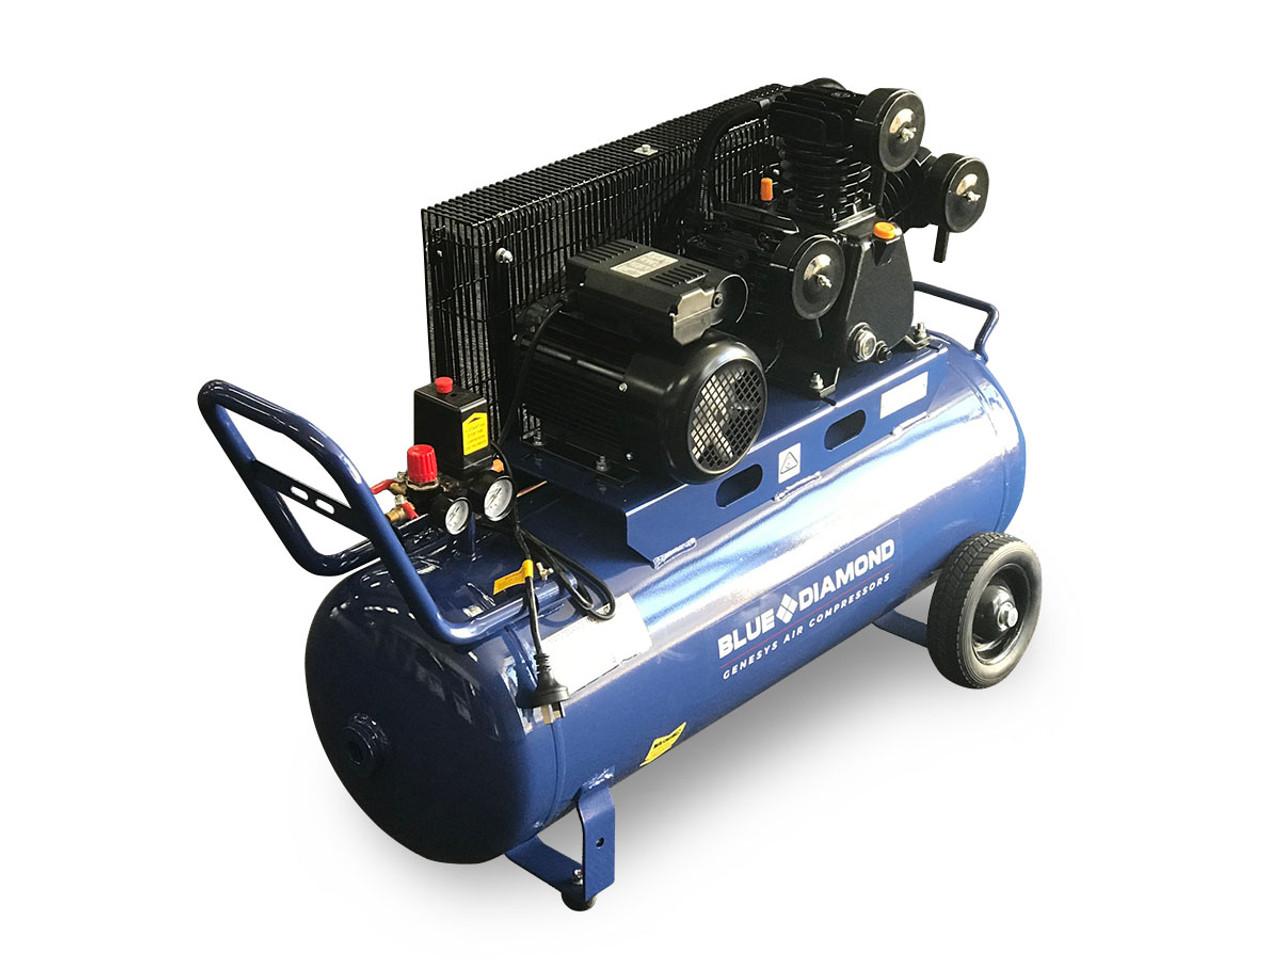 Piston Air Compressor- Electric 3HP 18 CFM 100L - 125 PSI